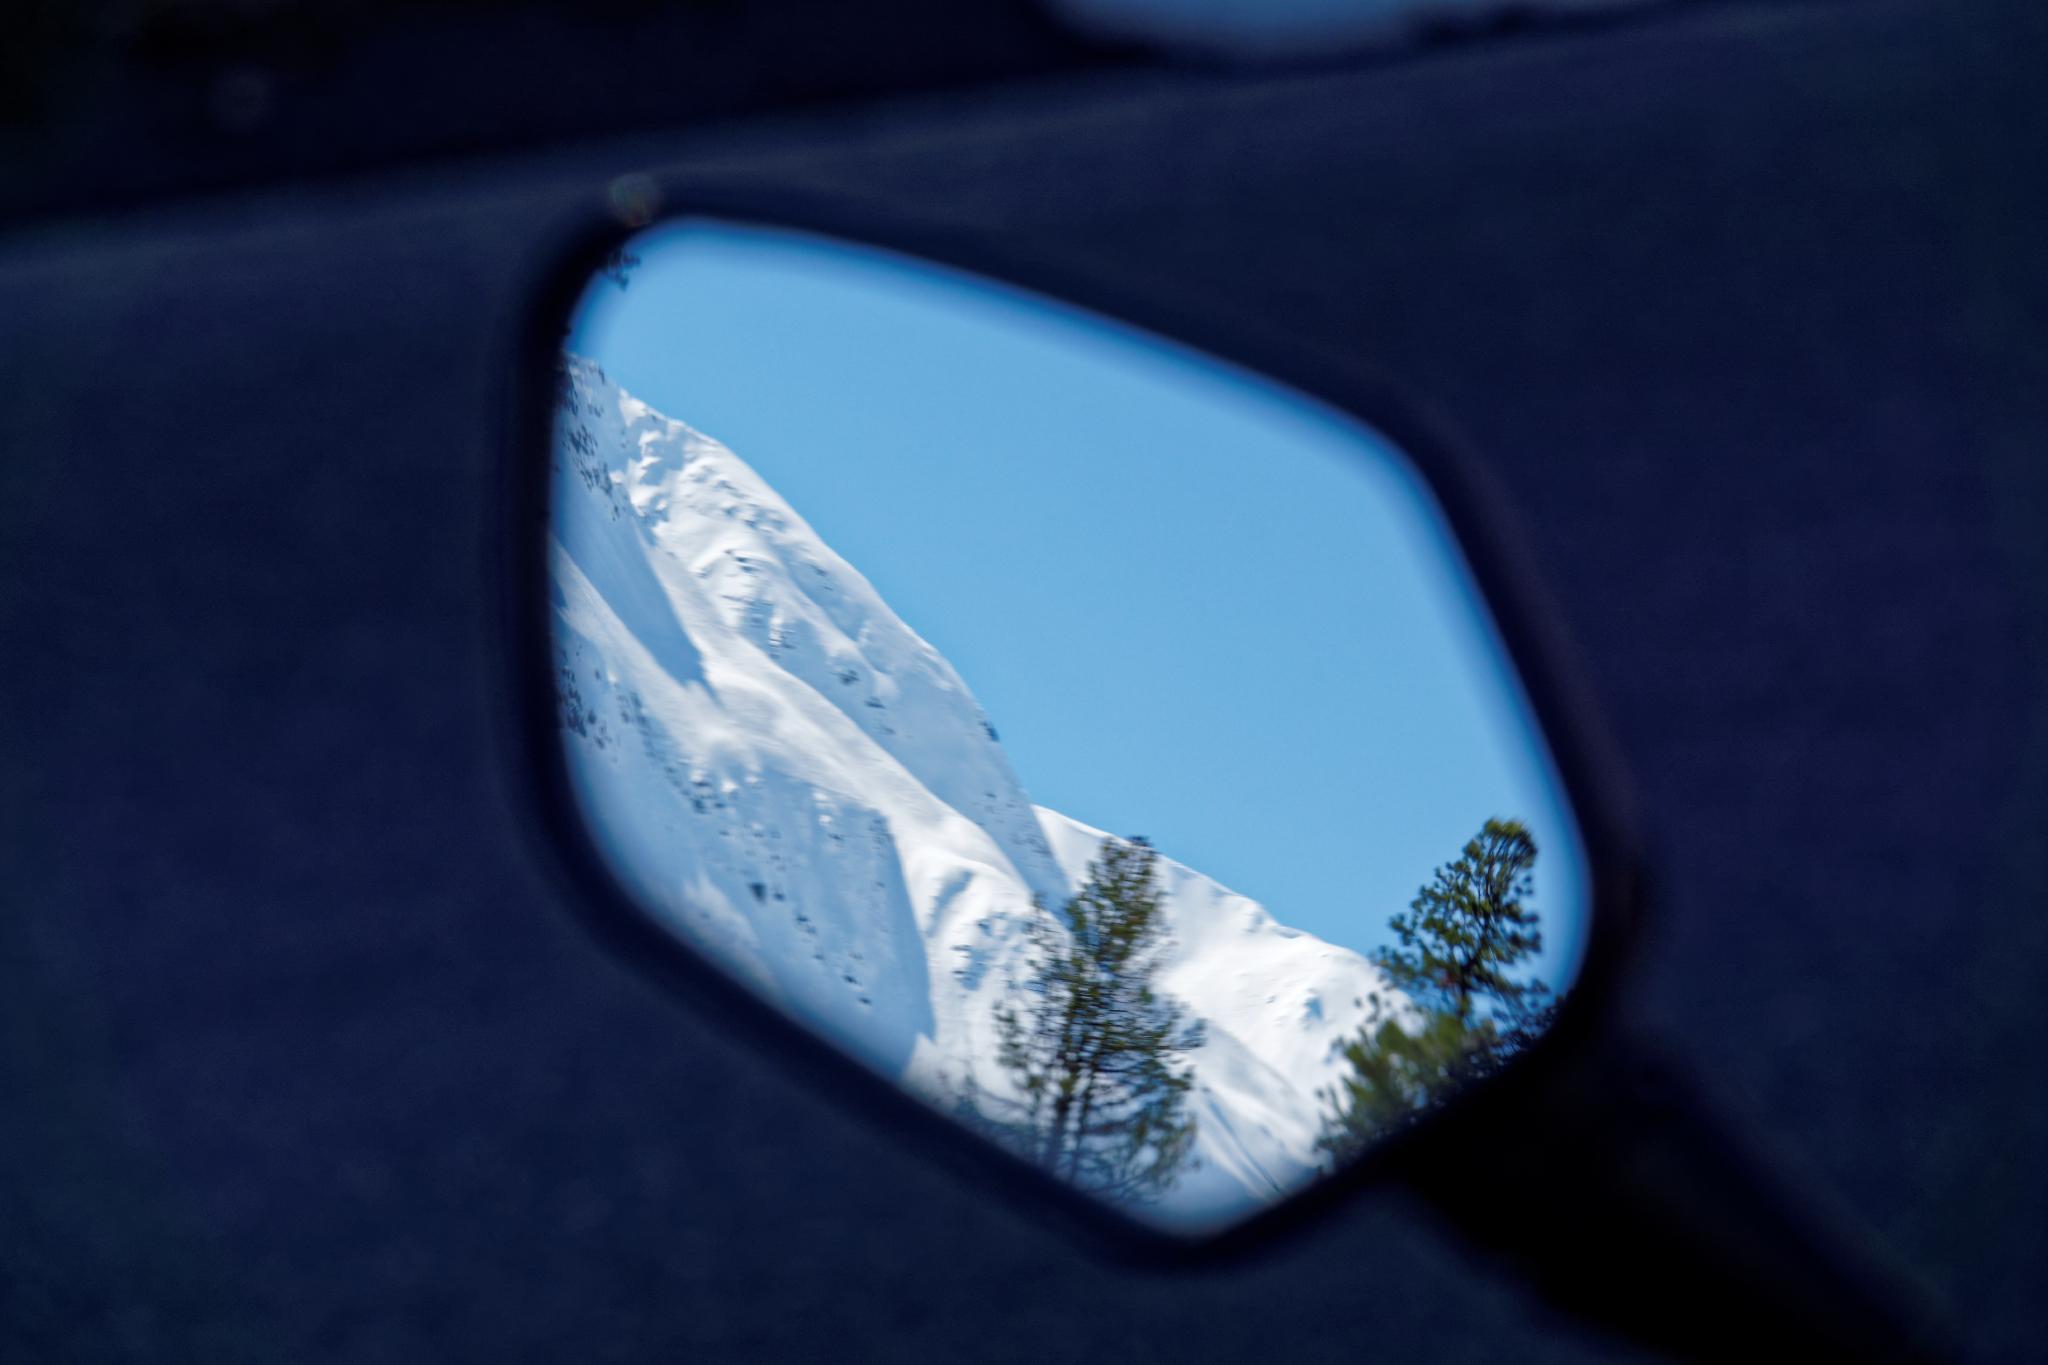 Rückspiegel-Blick auf den Gletscher